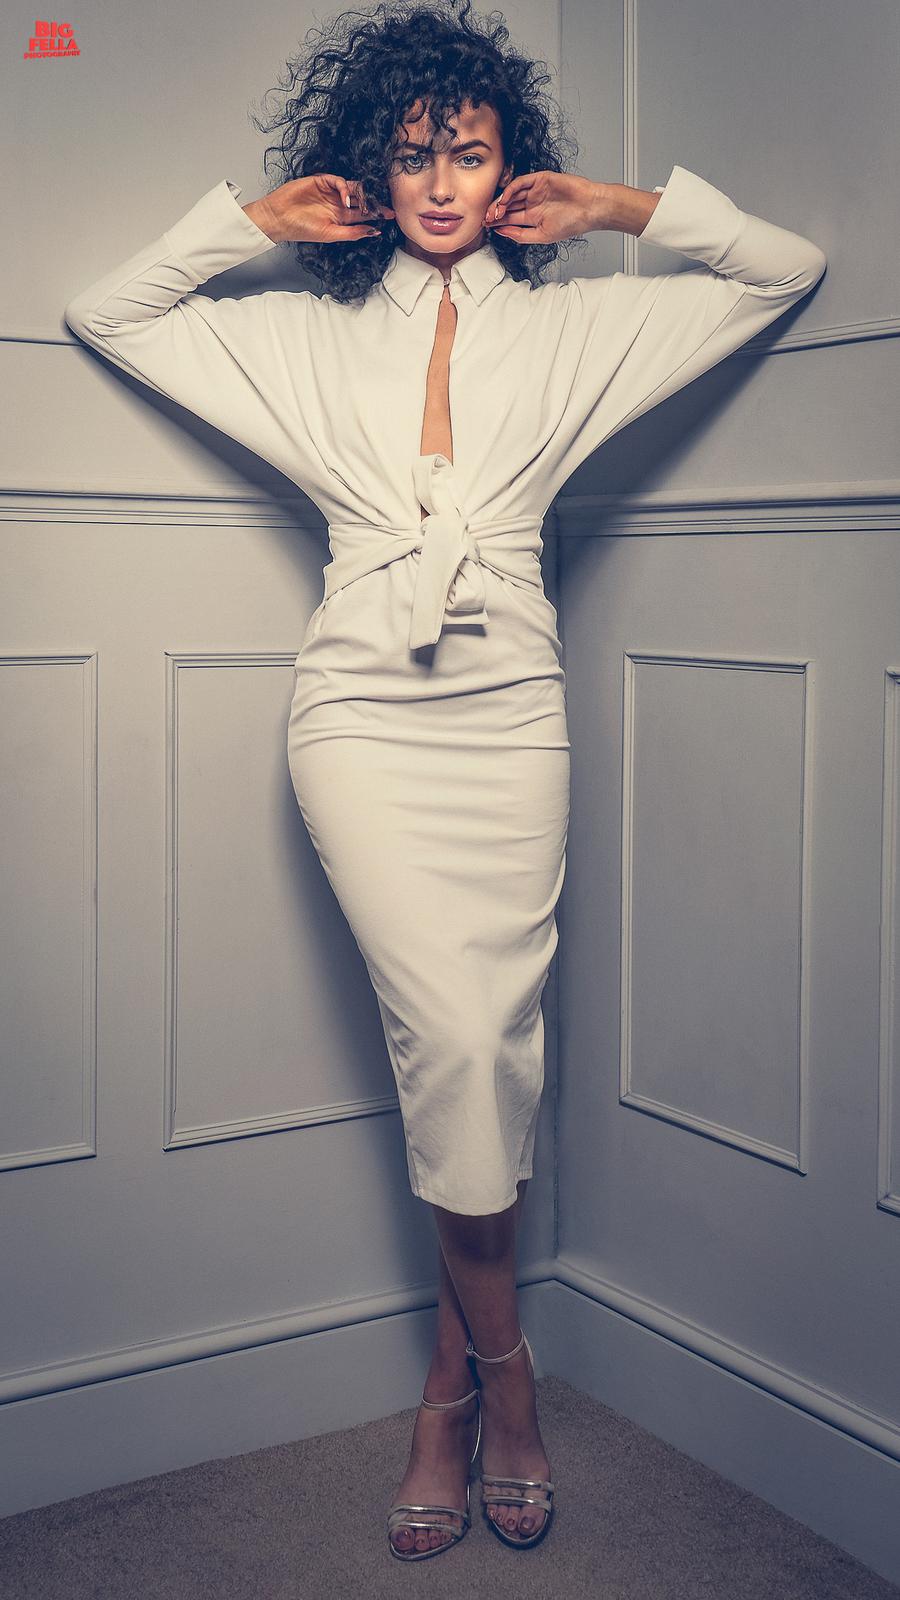 Fashion Corner / Photography by Big Fella Photography, Model Ashleigh Rae, Taken at msfoto / Uploaded 1st September 2019 @ 10:08 AM